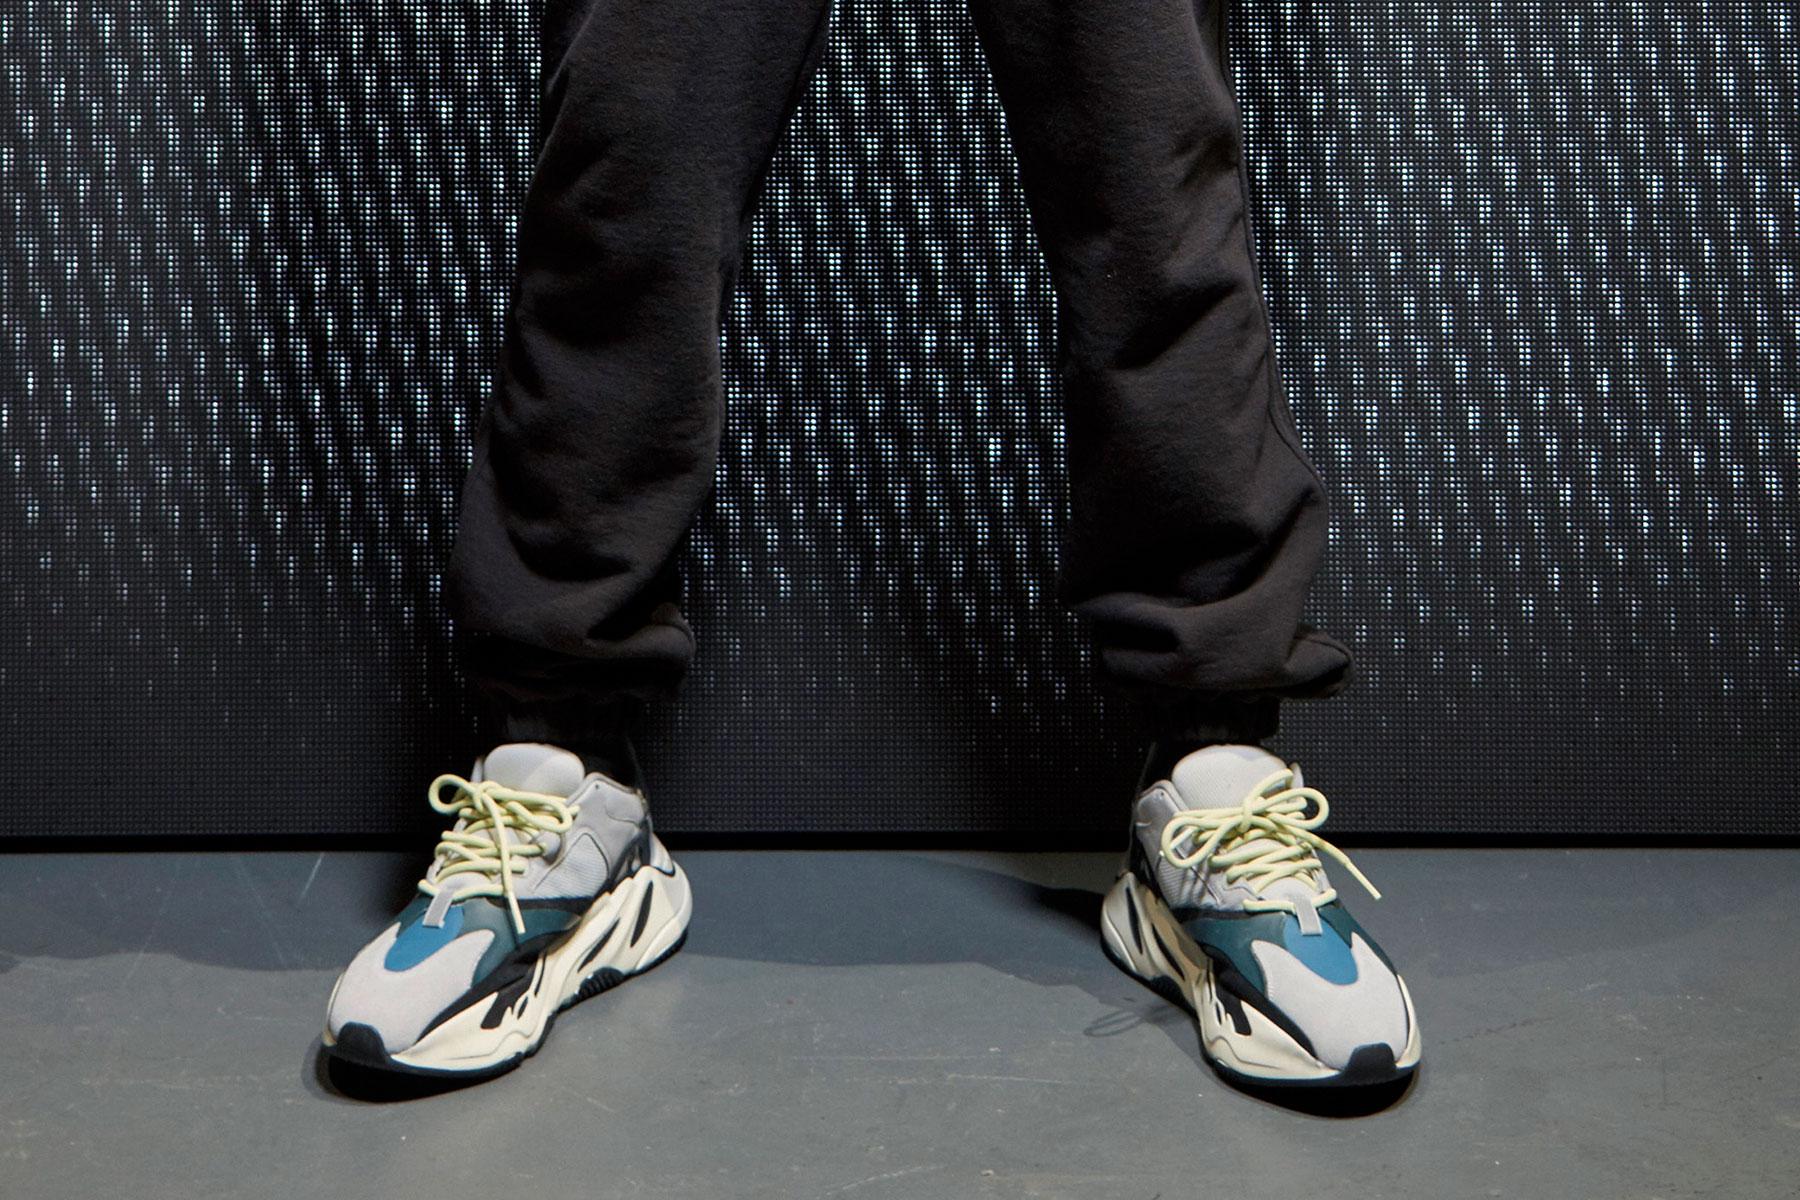 Better Look adidas Originals YEEZY Runners YEEZY SEASON 5 Presentation